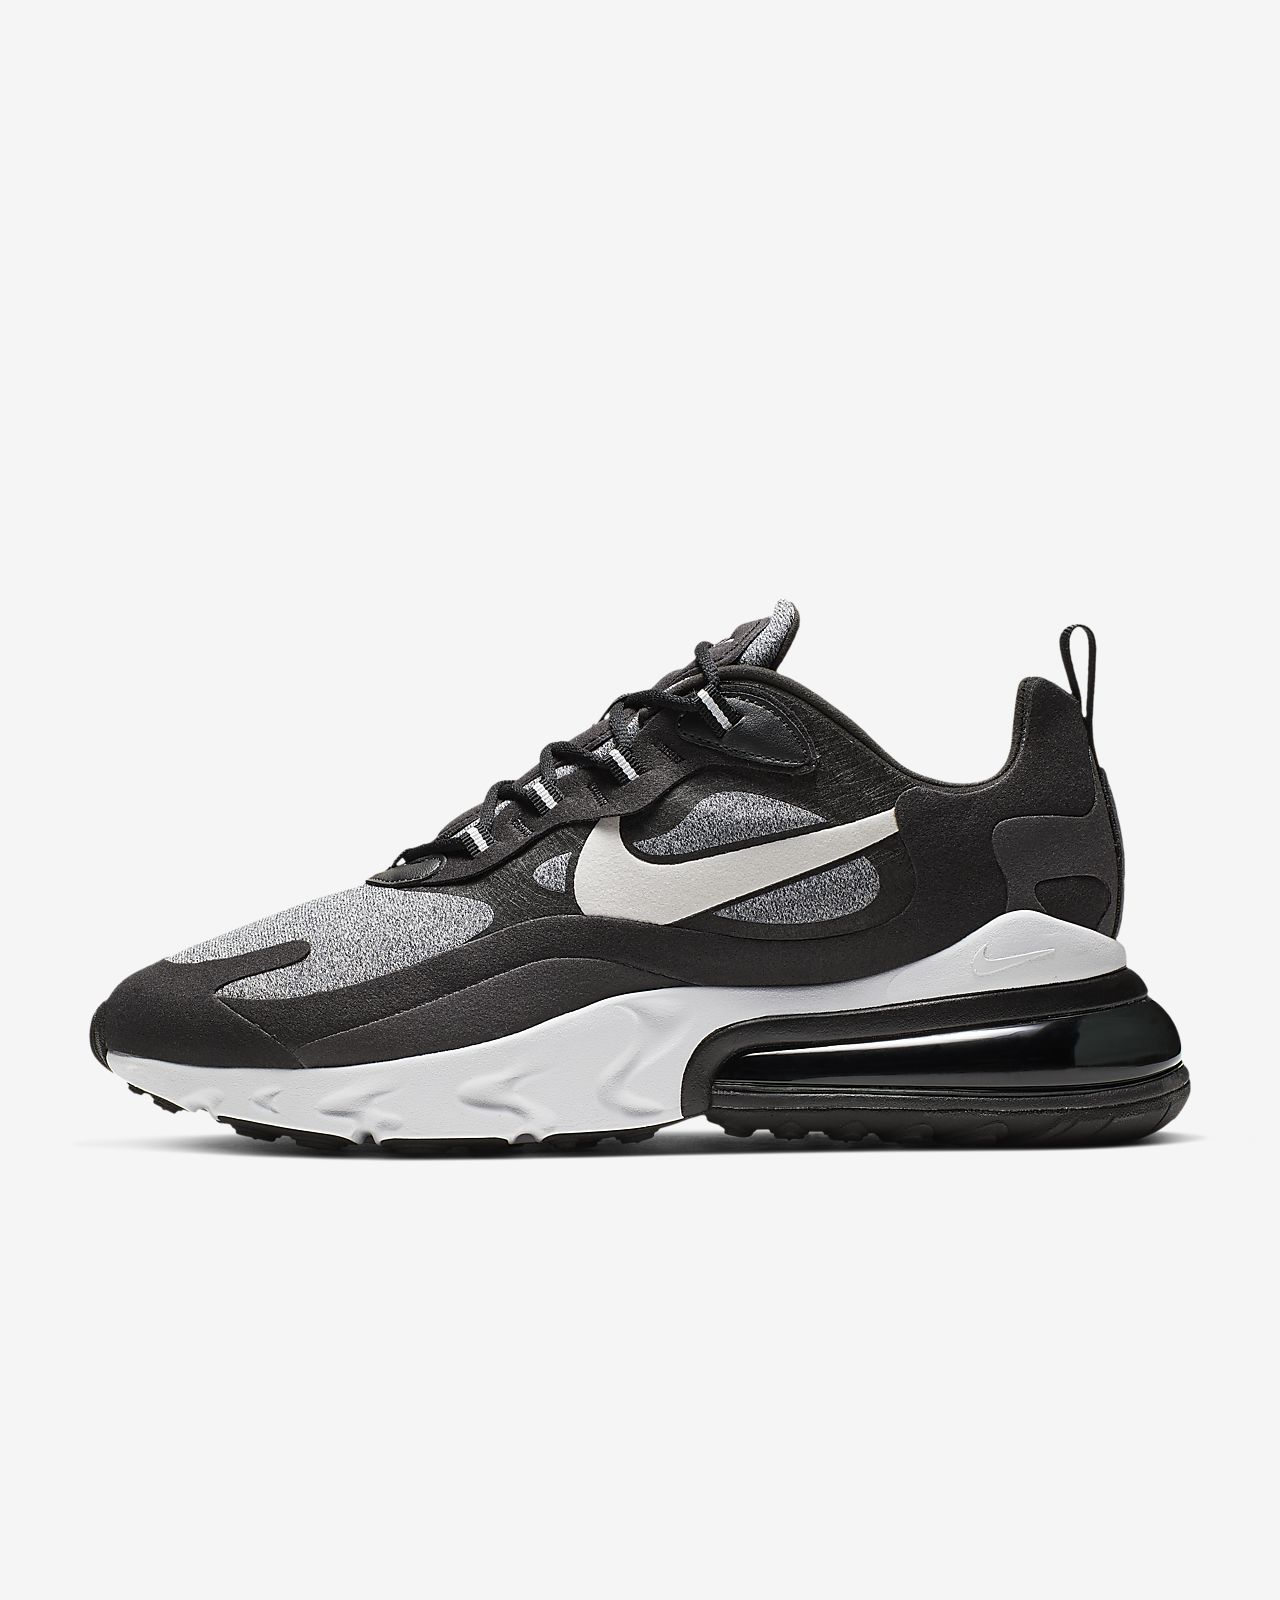 df4ccc85b Nike Air Max 270 React Men's Shoe. Nike.com